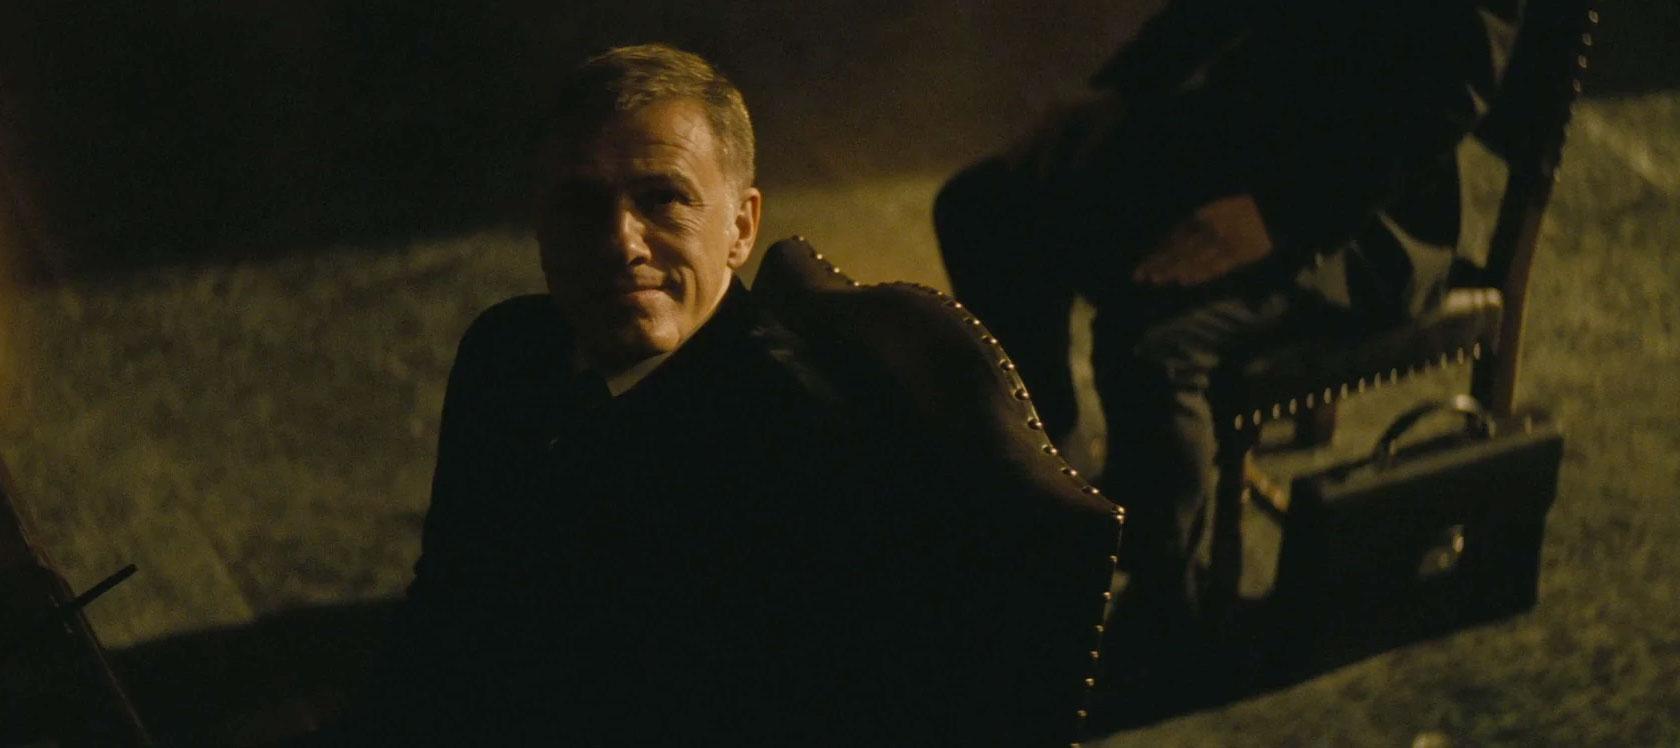 Report: Christoph Waltz Returning as Blofeld for James Bond 25